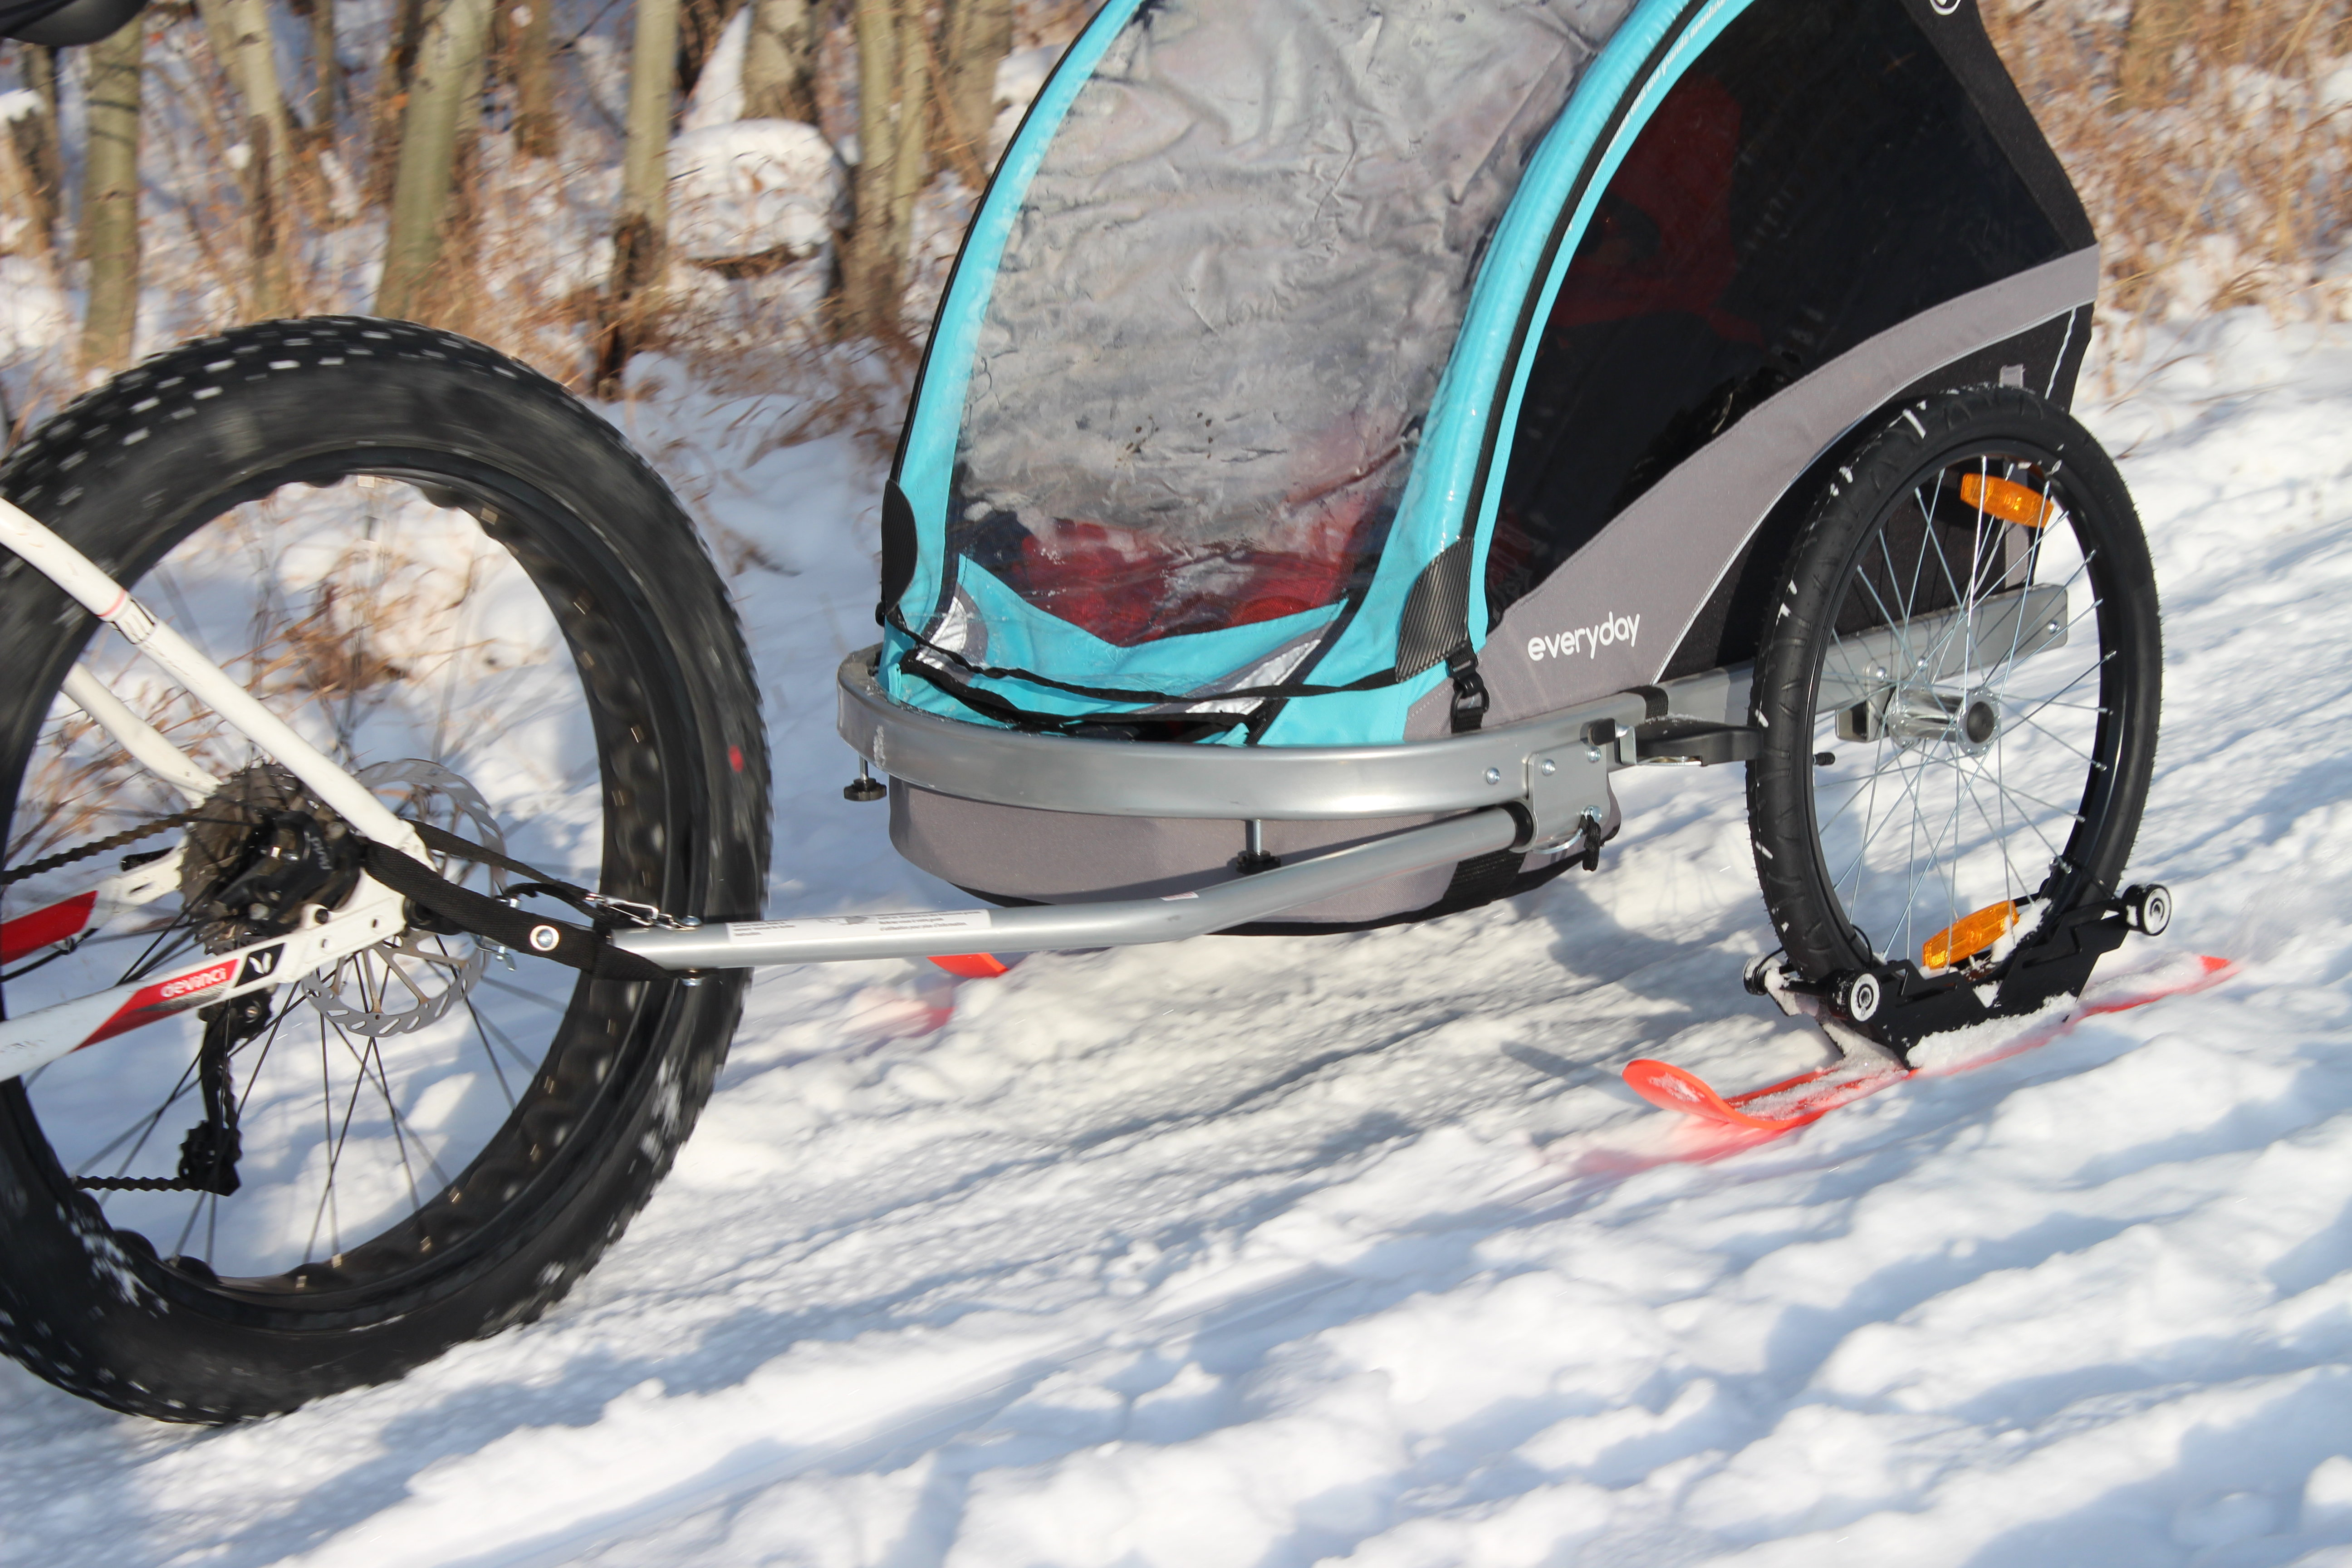 INDIVIDUAL- RX3 Polar Stroller Ski